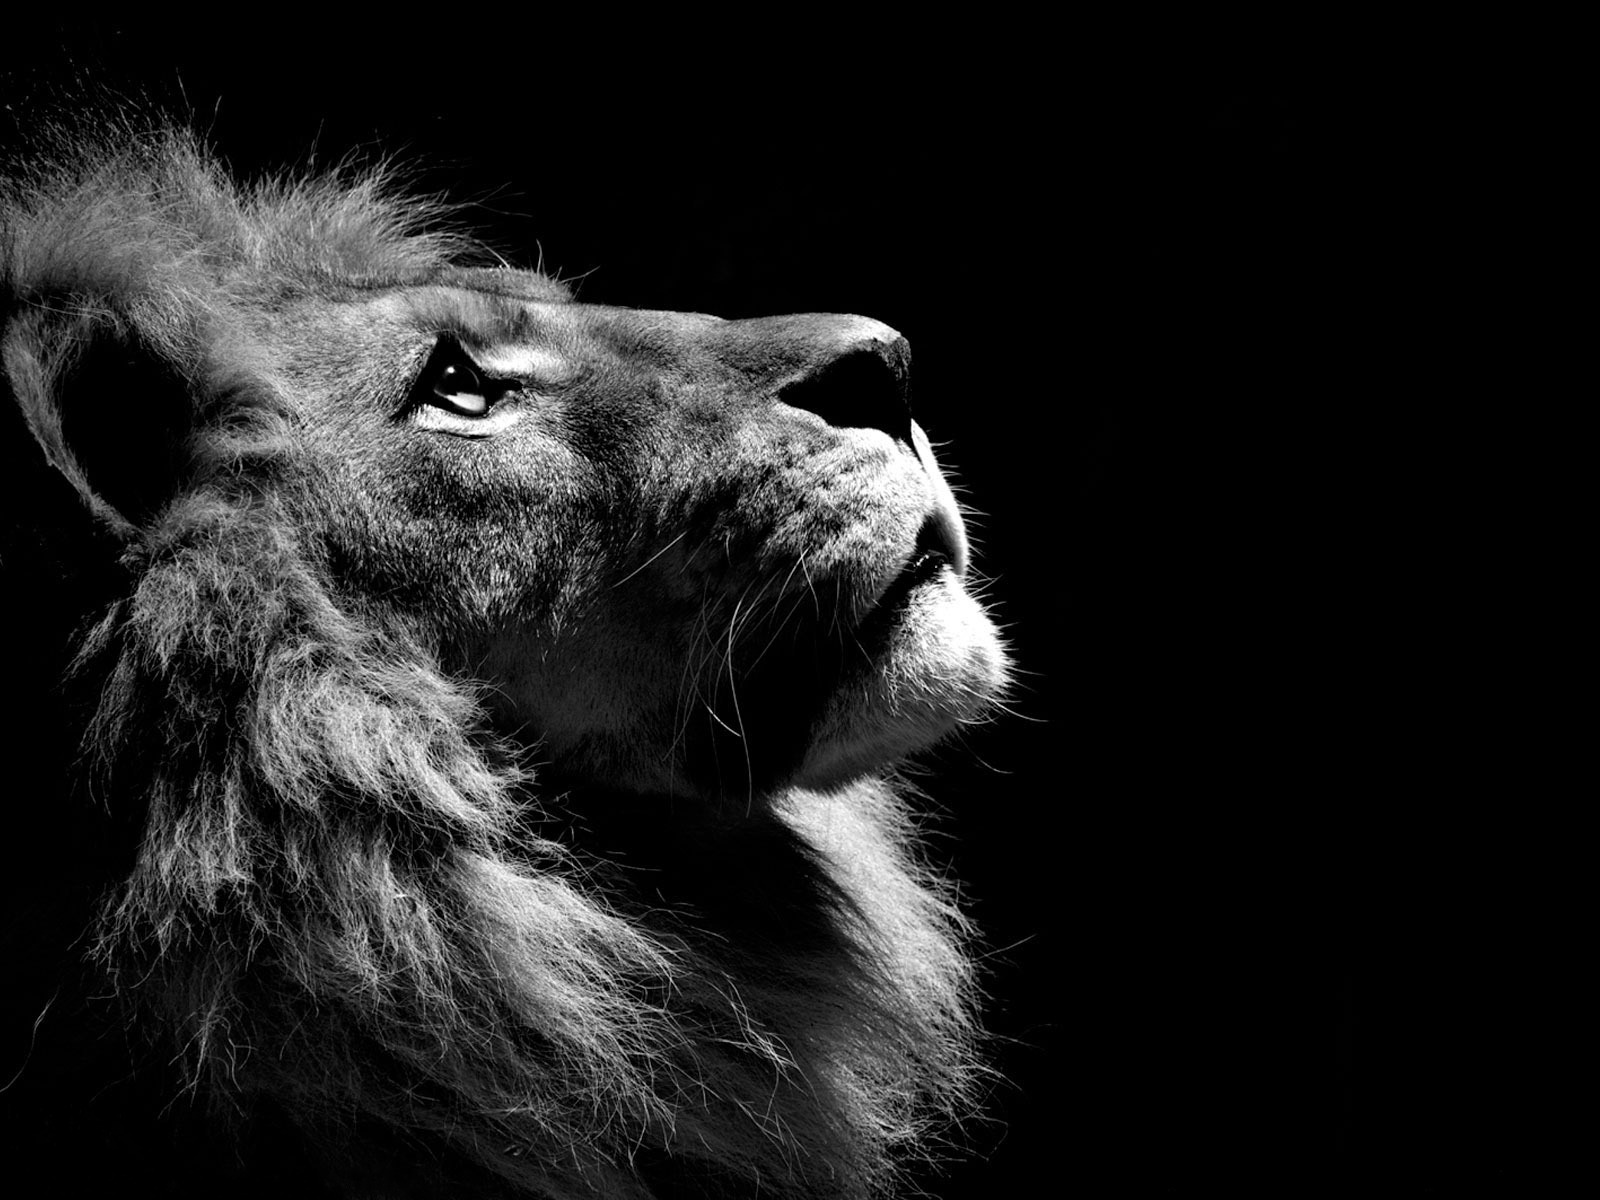 black-and-white-lion-animal-theme-cats-311421www.baseheadart.com_.jpg